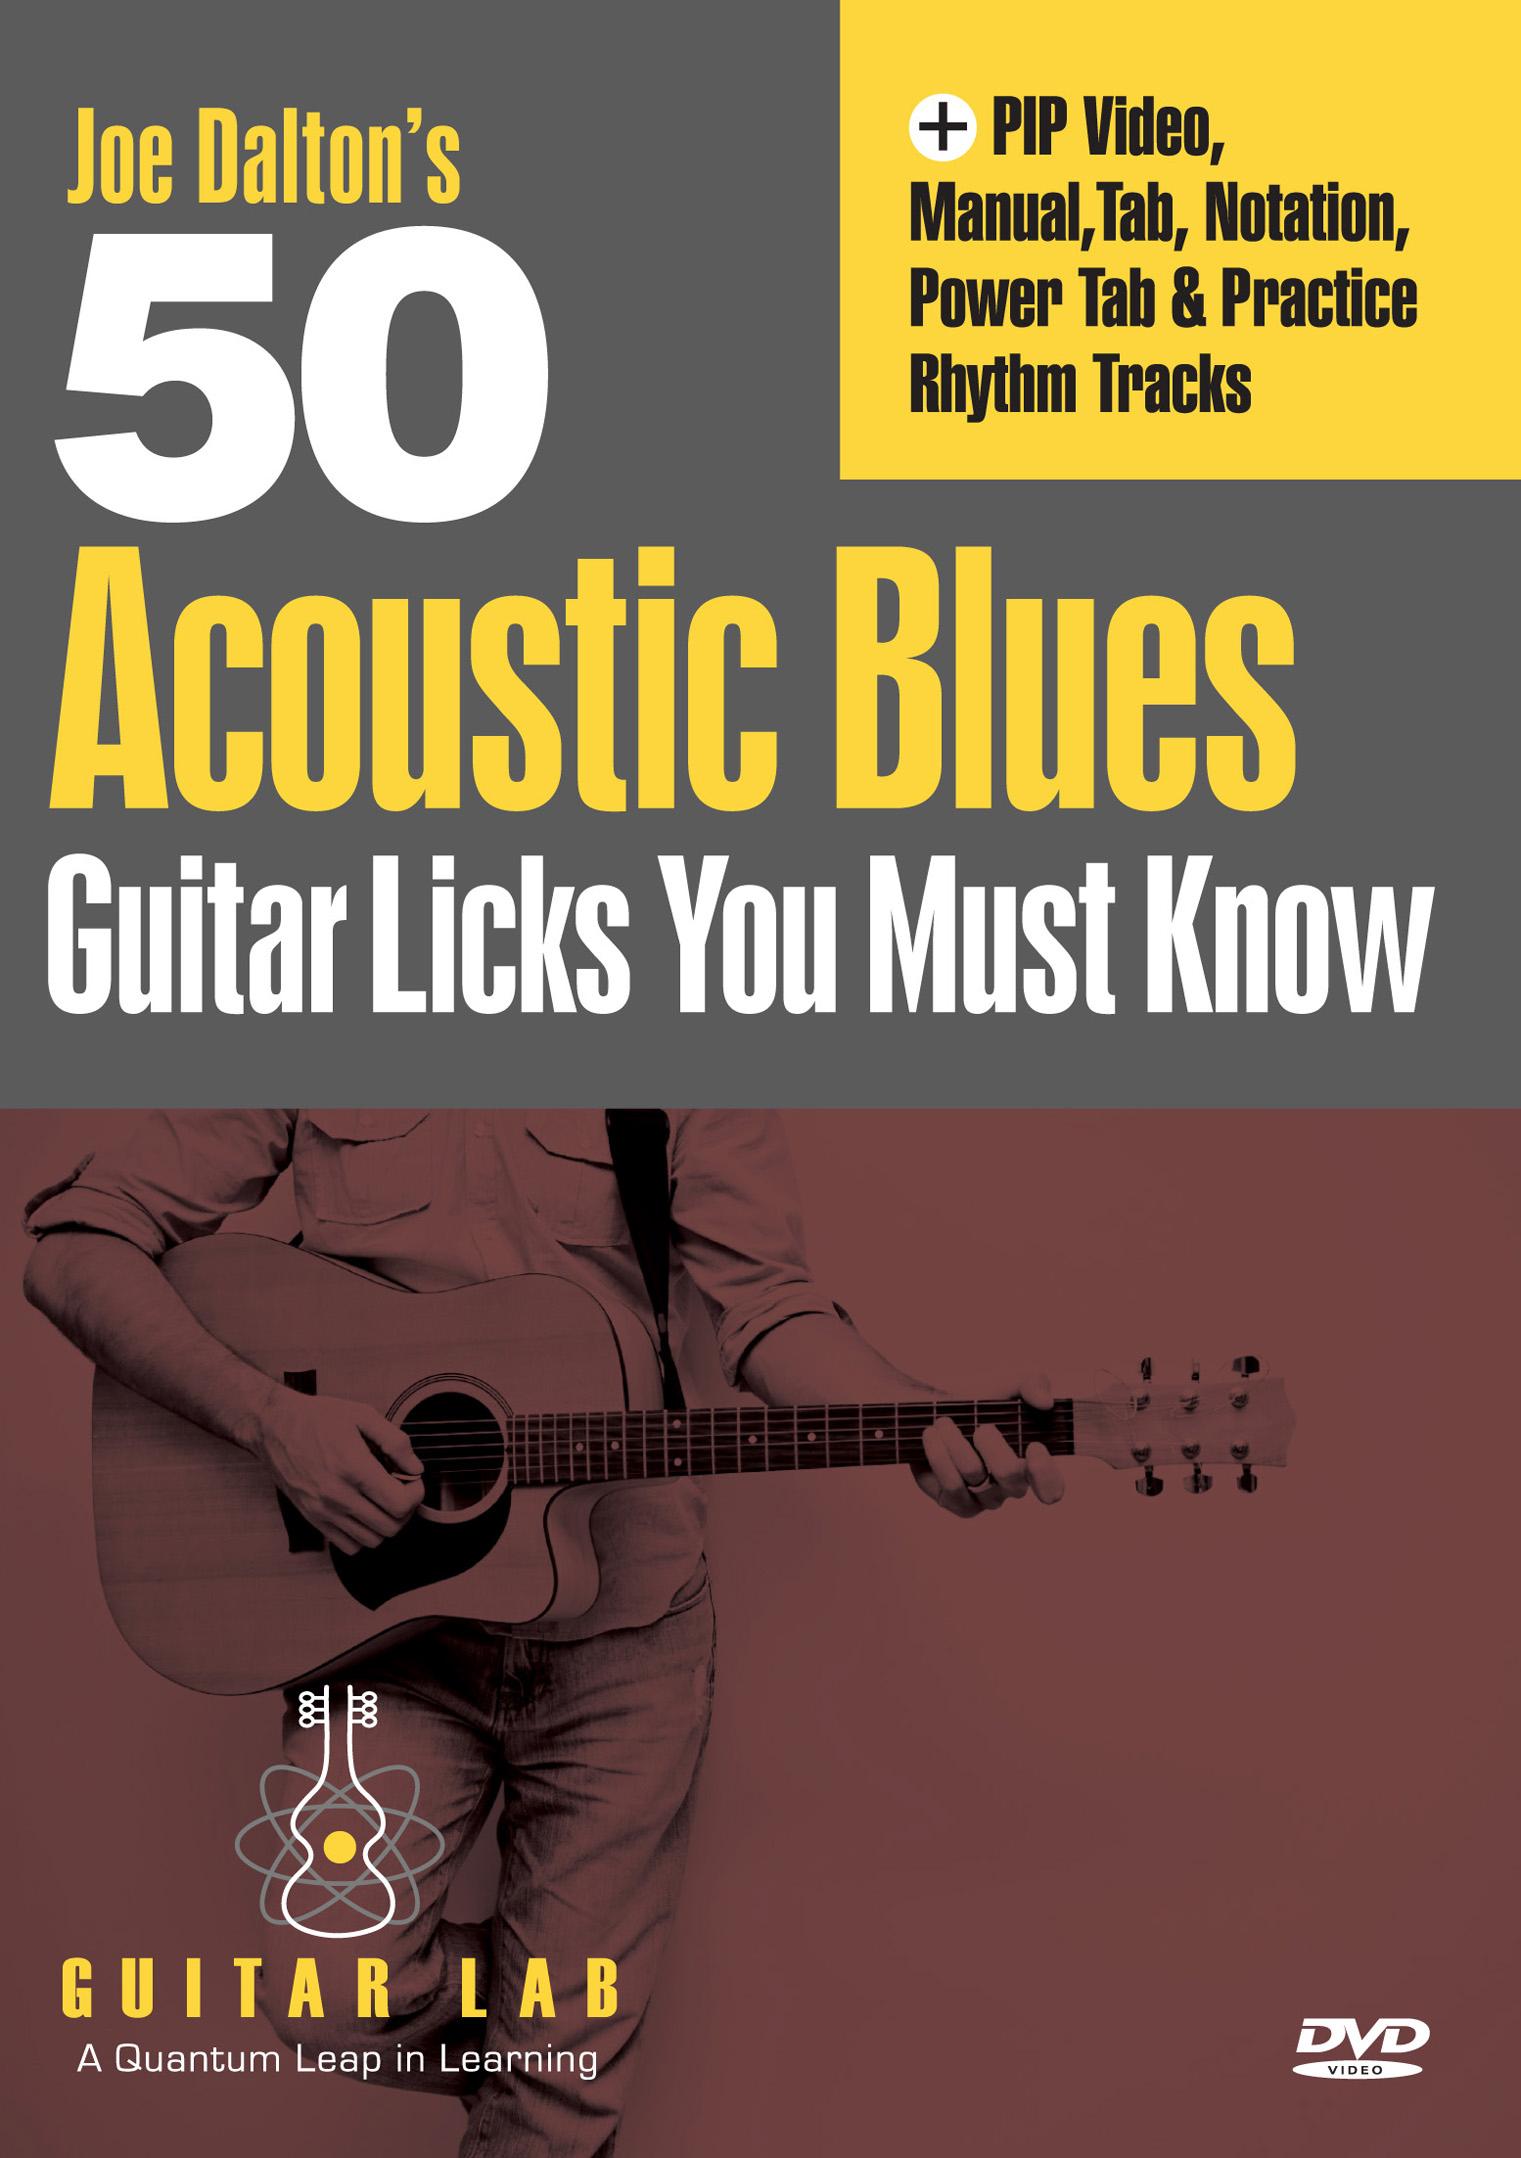 Joe Dalton's 50 Acoustic Blues Guitar Licks You Must Know